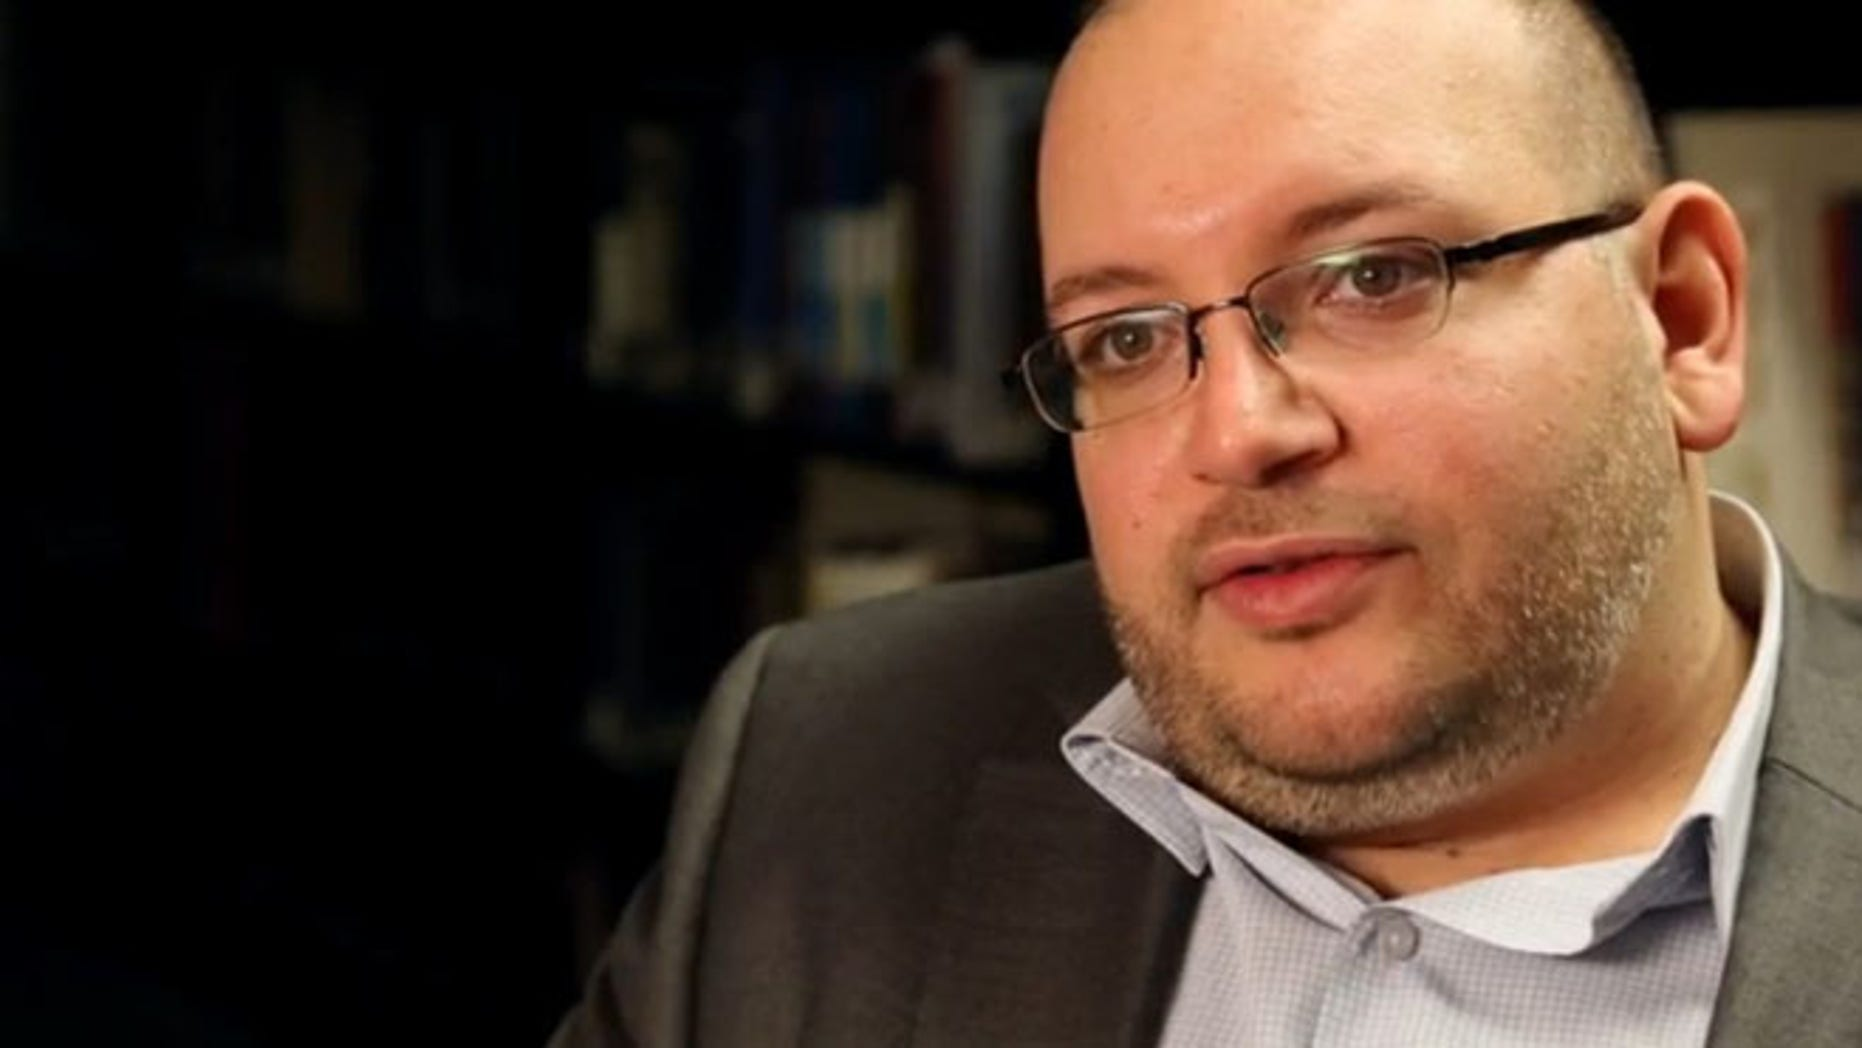 Jason Rezaian, The Washington Post's Tehran correspondent, is seen in this undated file photo.